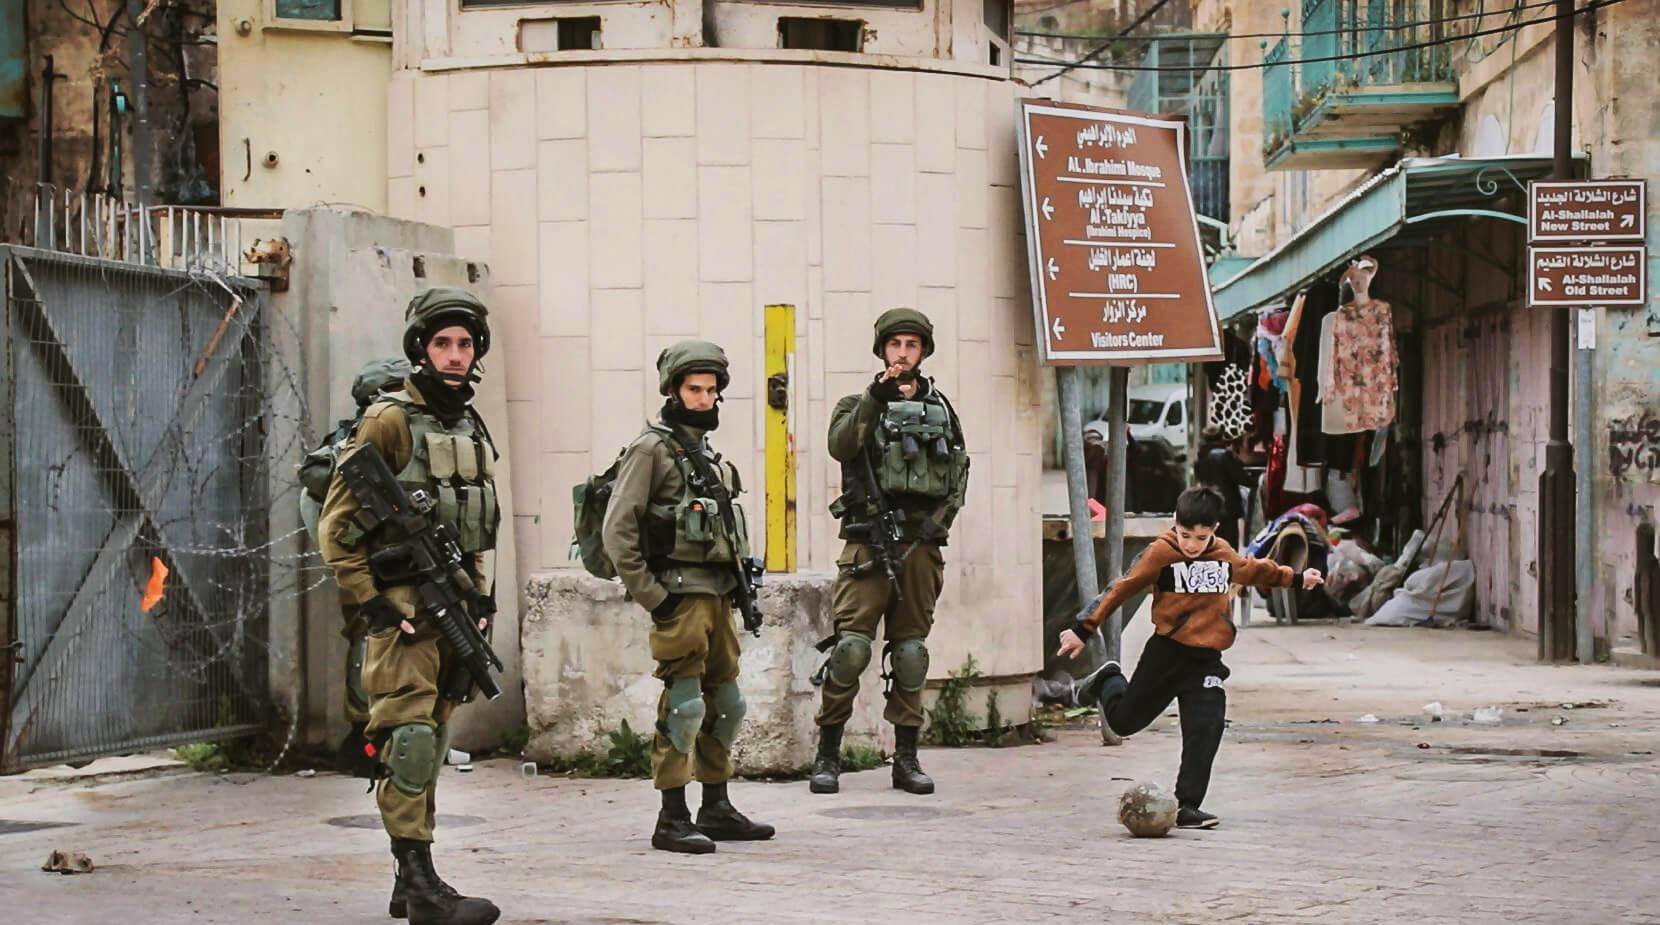 Just a regular day in Hebron.jpg